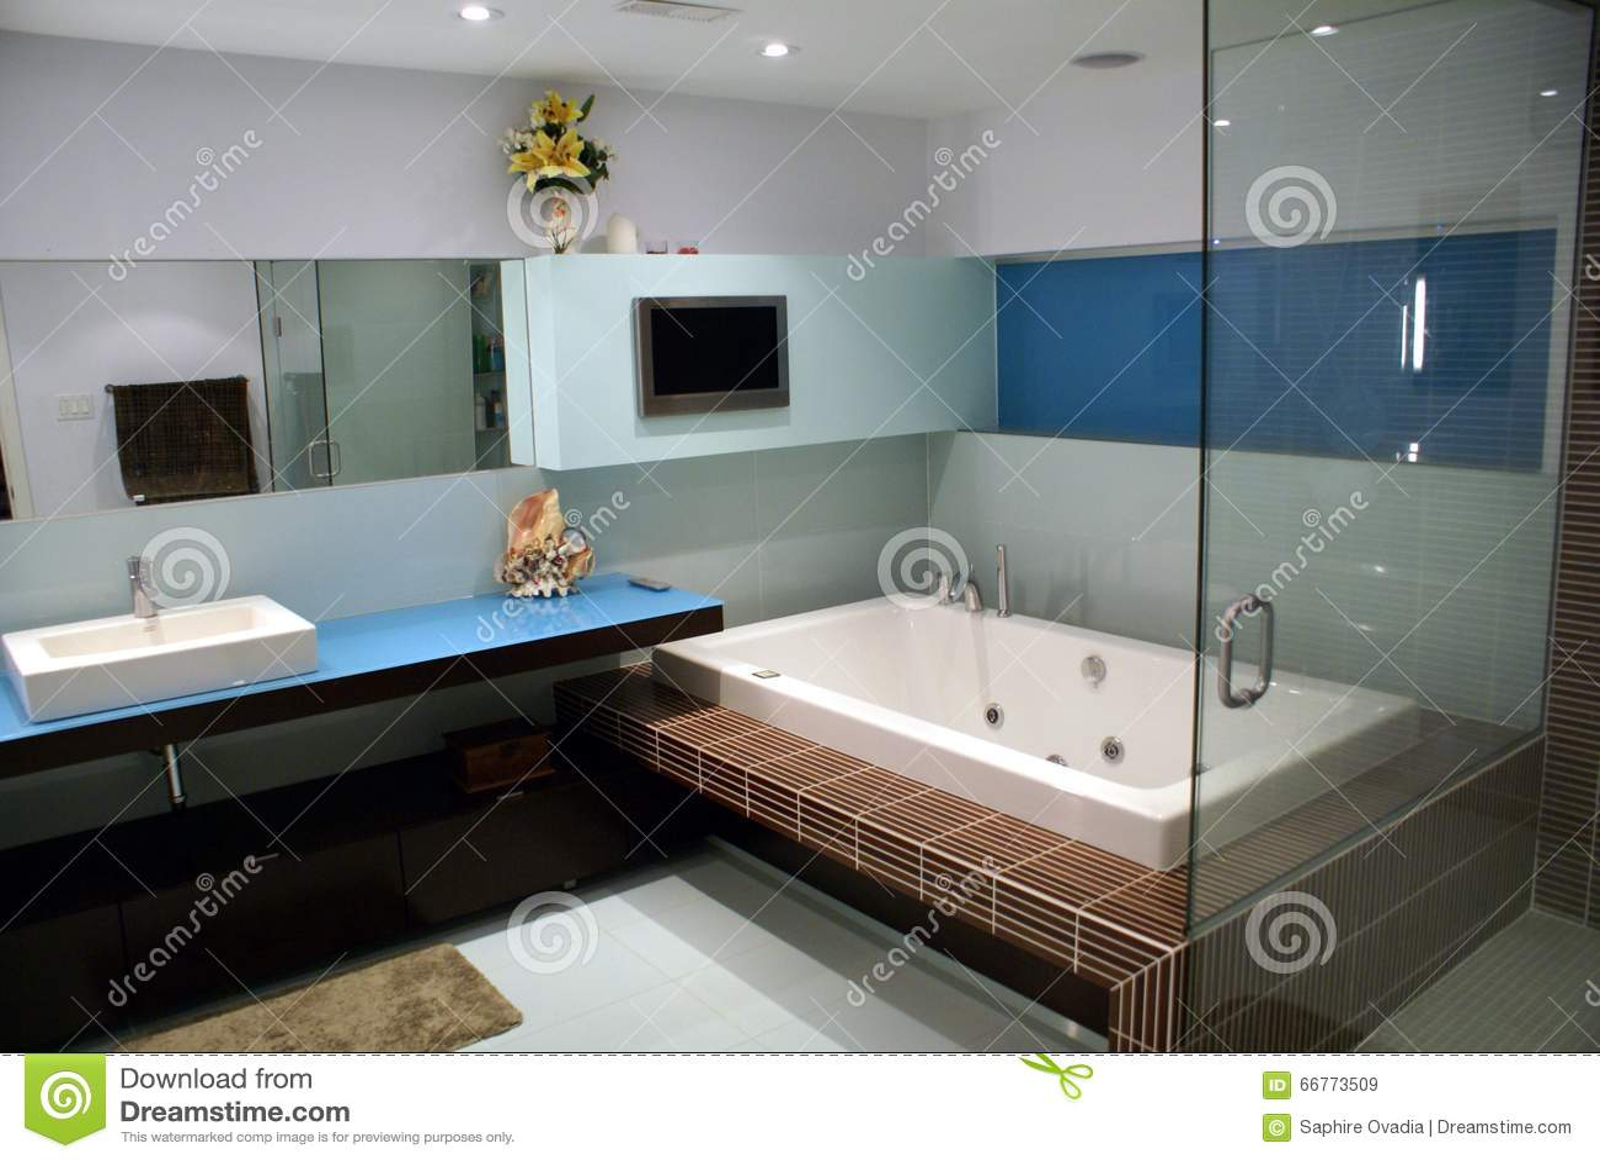 Vasca Da Bagno Jacuzzi Usata : Jacuzzi vasca calda bagno stazione termale immagine stock immagine